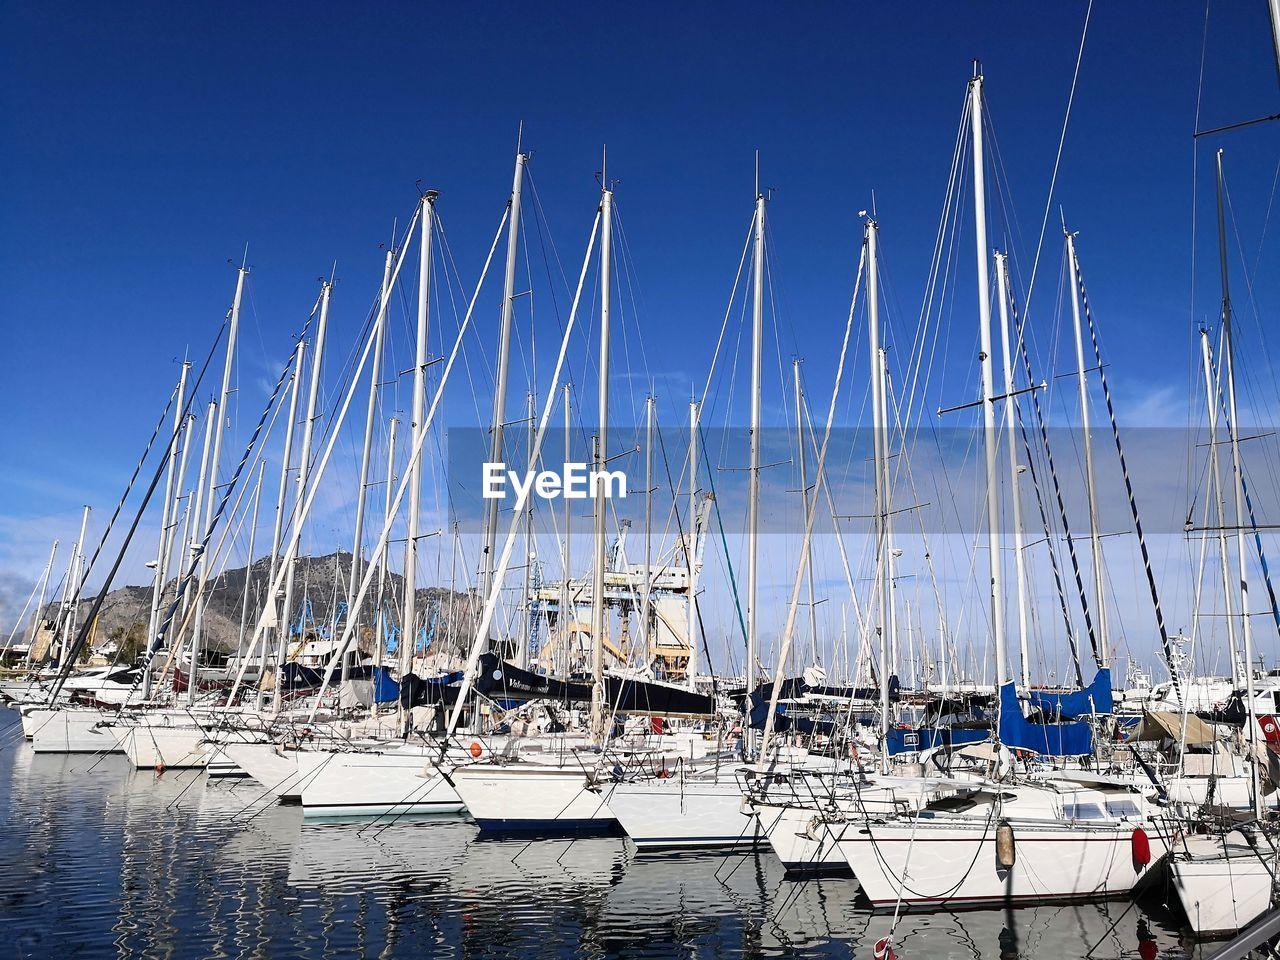 nautical vessel, transportation, mode of transportation, sailboat, water, moored, pole, mast, harbor, no people, day, sky, nature, sea, blue, clear sky, outdoors, abundance, yacht, marina, port